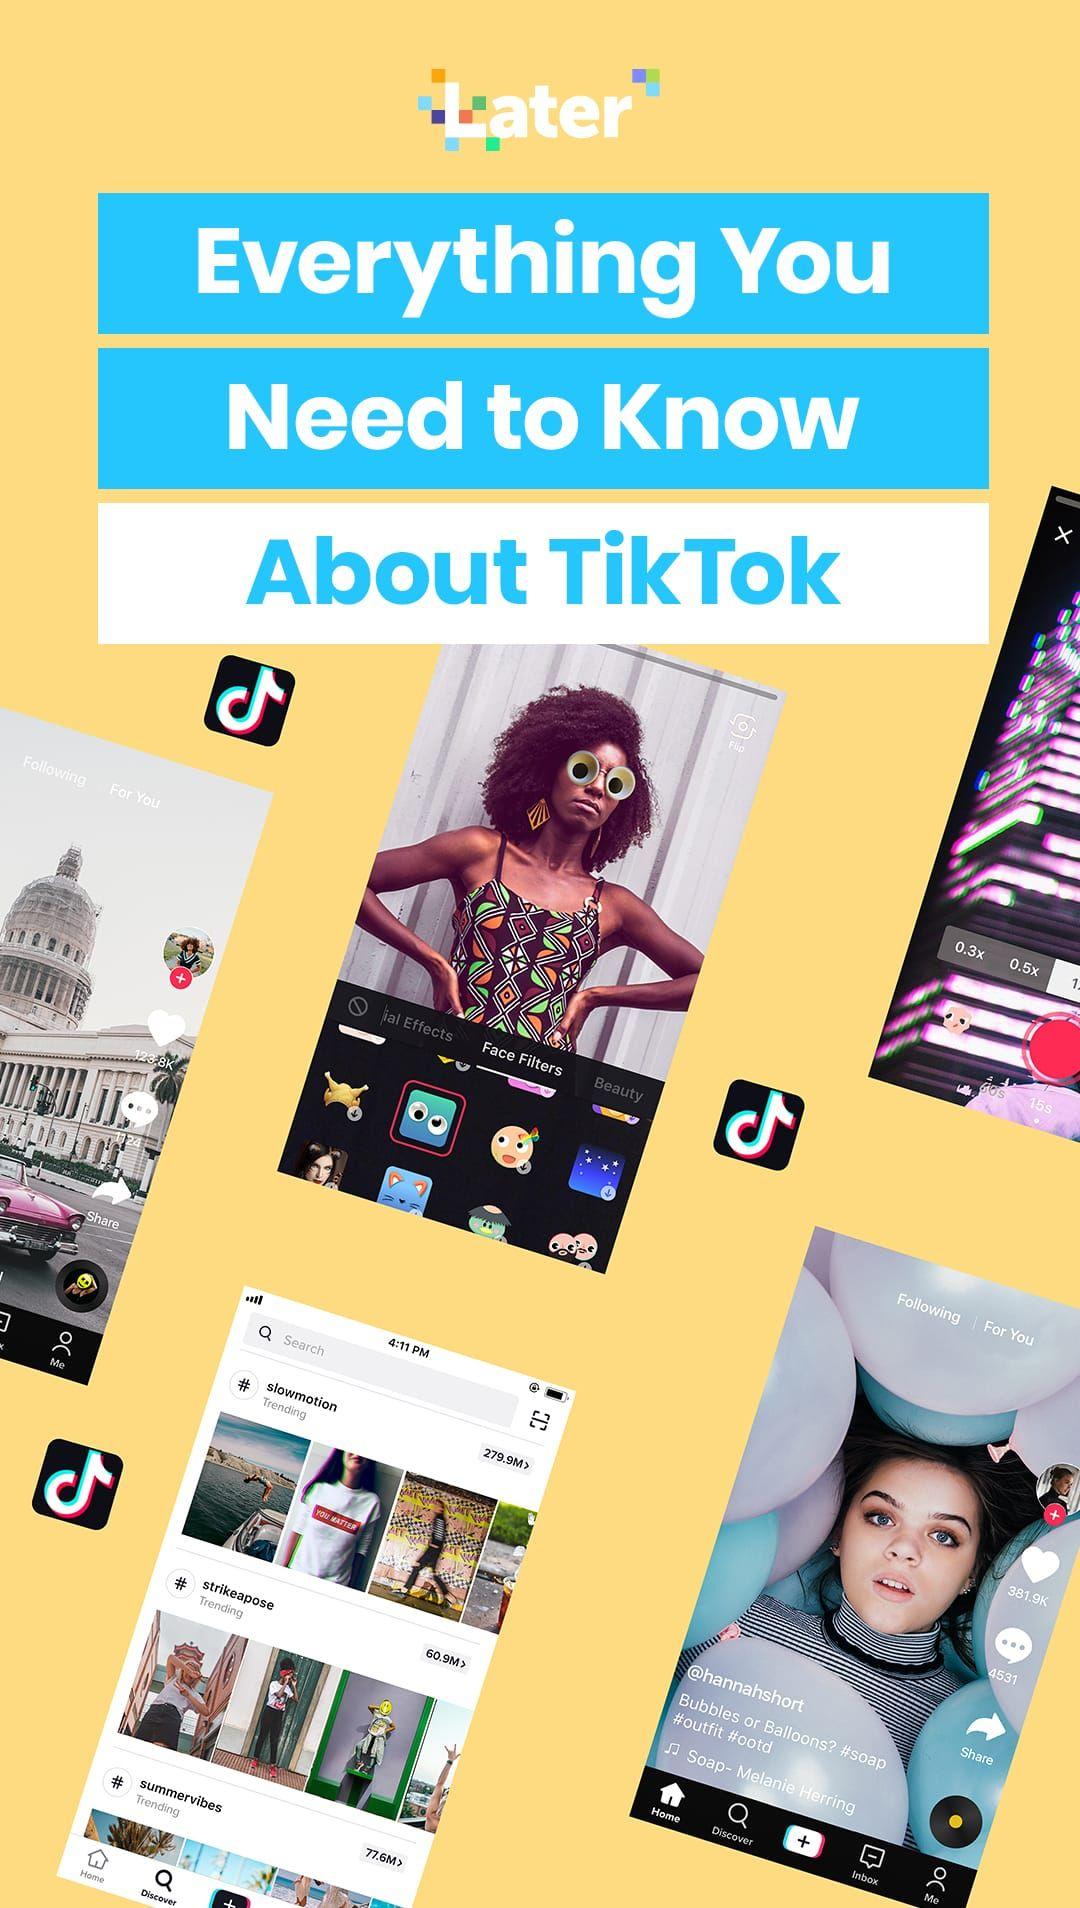 Best Tik Tok Video Downloader Apps Https Www Geeksgyaan Com 2019 08 Tiktok Video Downloader Html Tiktokindia Tiktok Video Downloader App Video Save Video